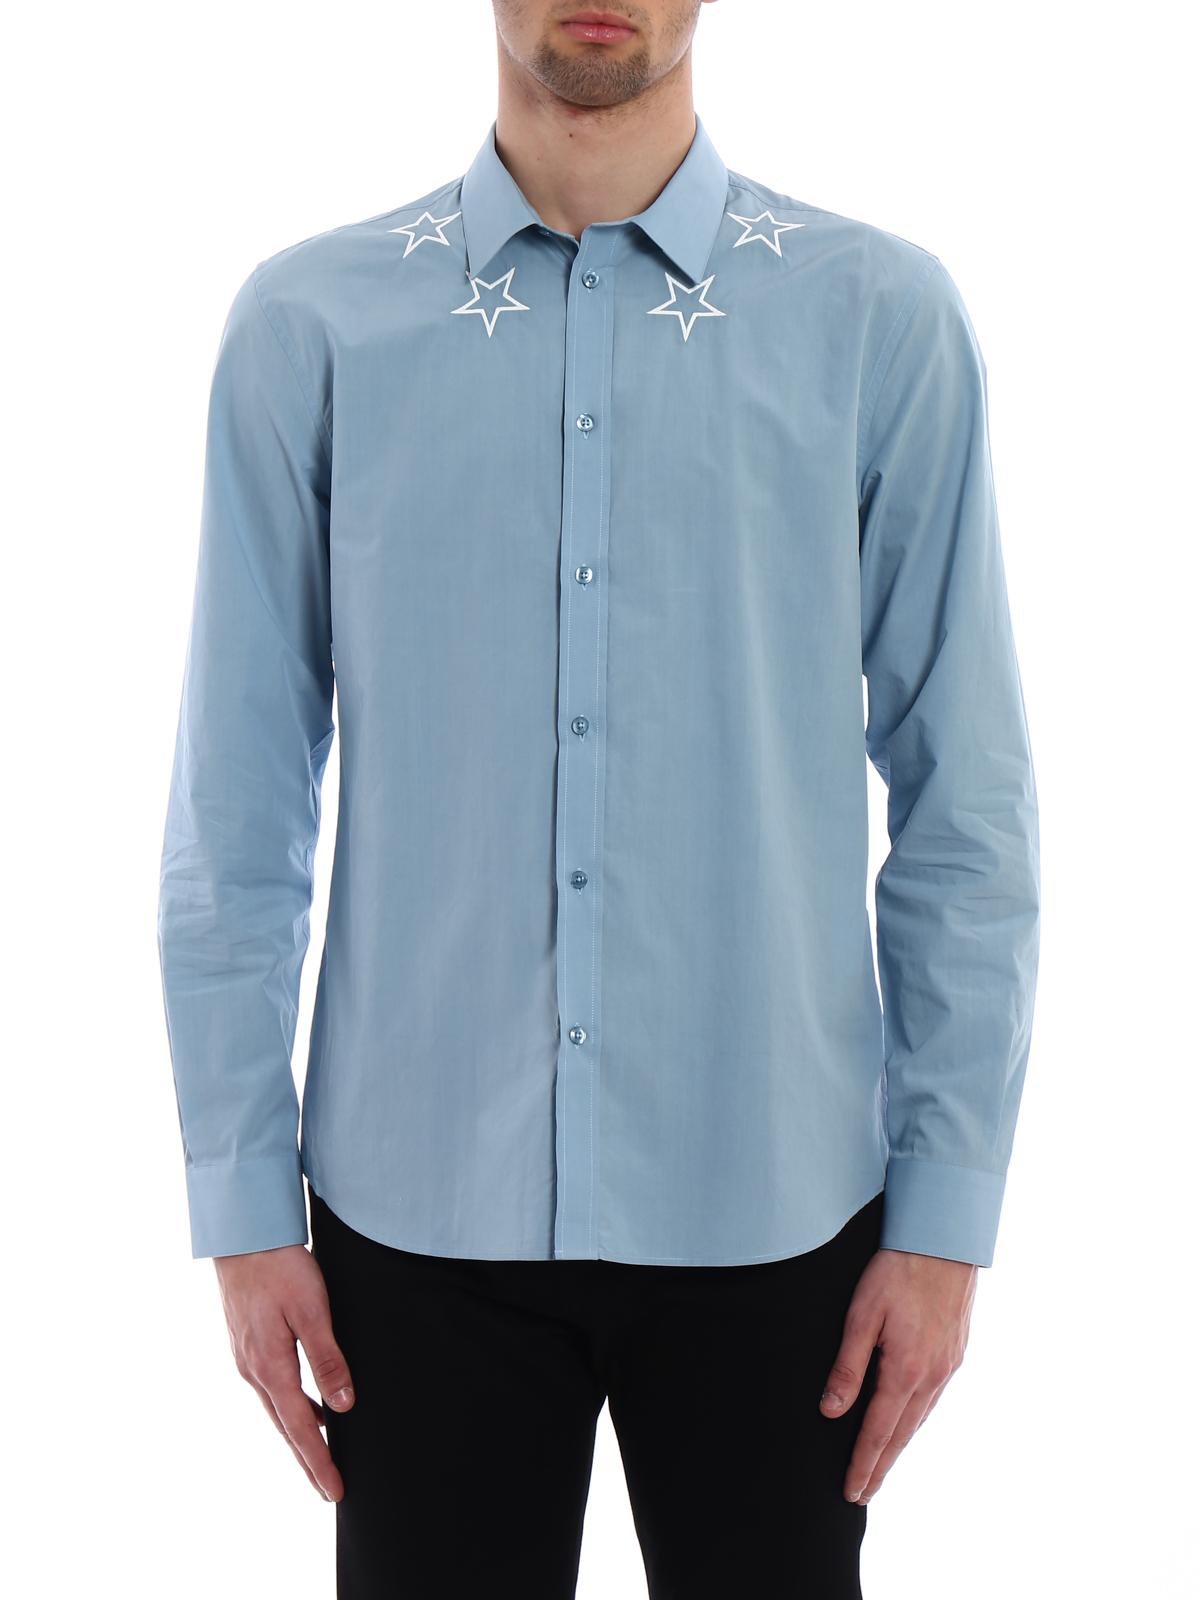 f09cd1efa5e Givenchy - Embroidered stars light blue shirt - shirts - BM6038109G452